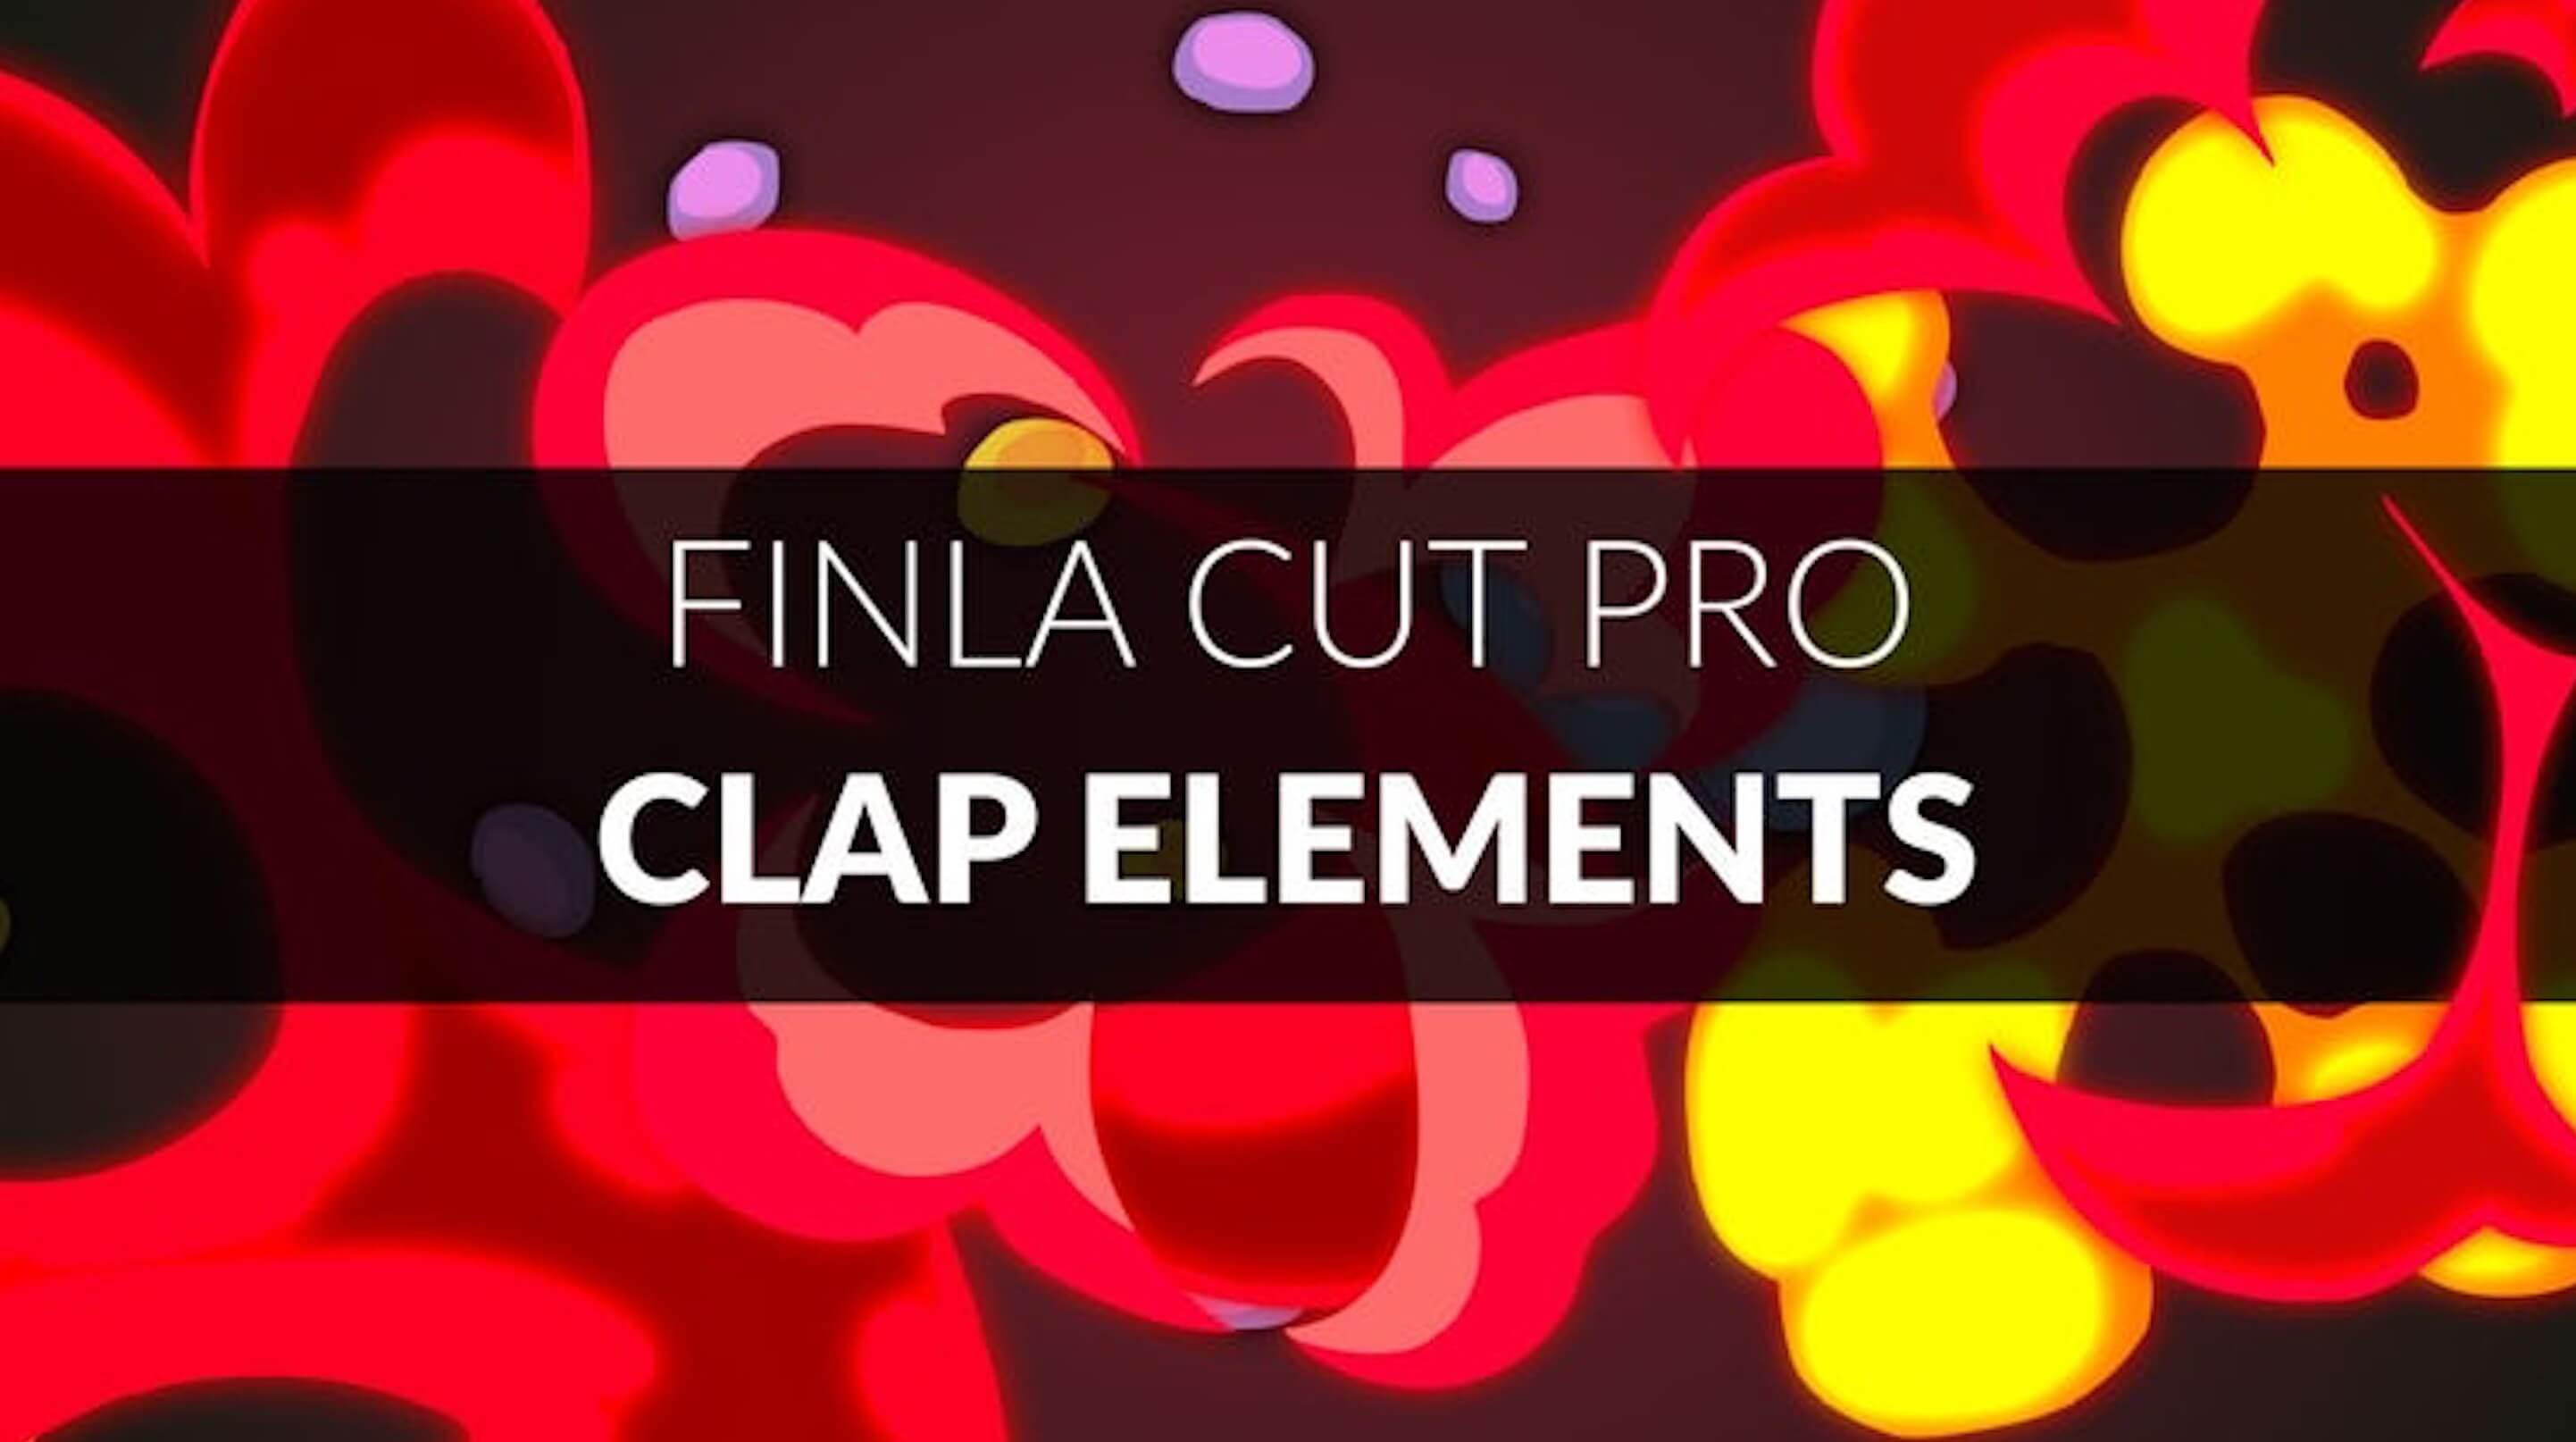 fcpx插件 16个精美炫酷装饰MG动画元素 可更改颜色 Clap Elements